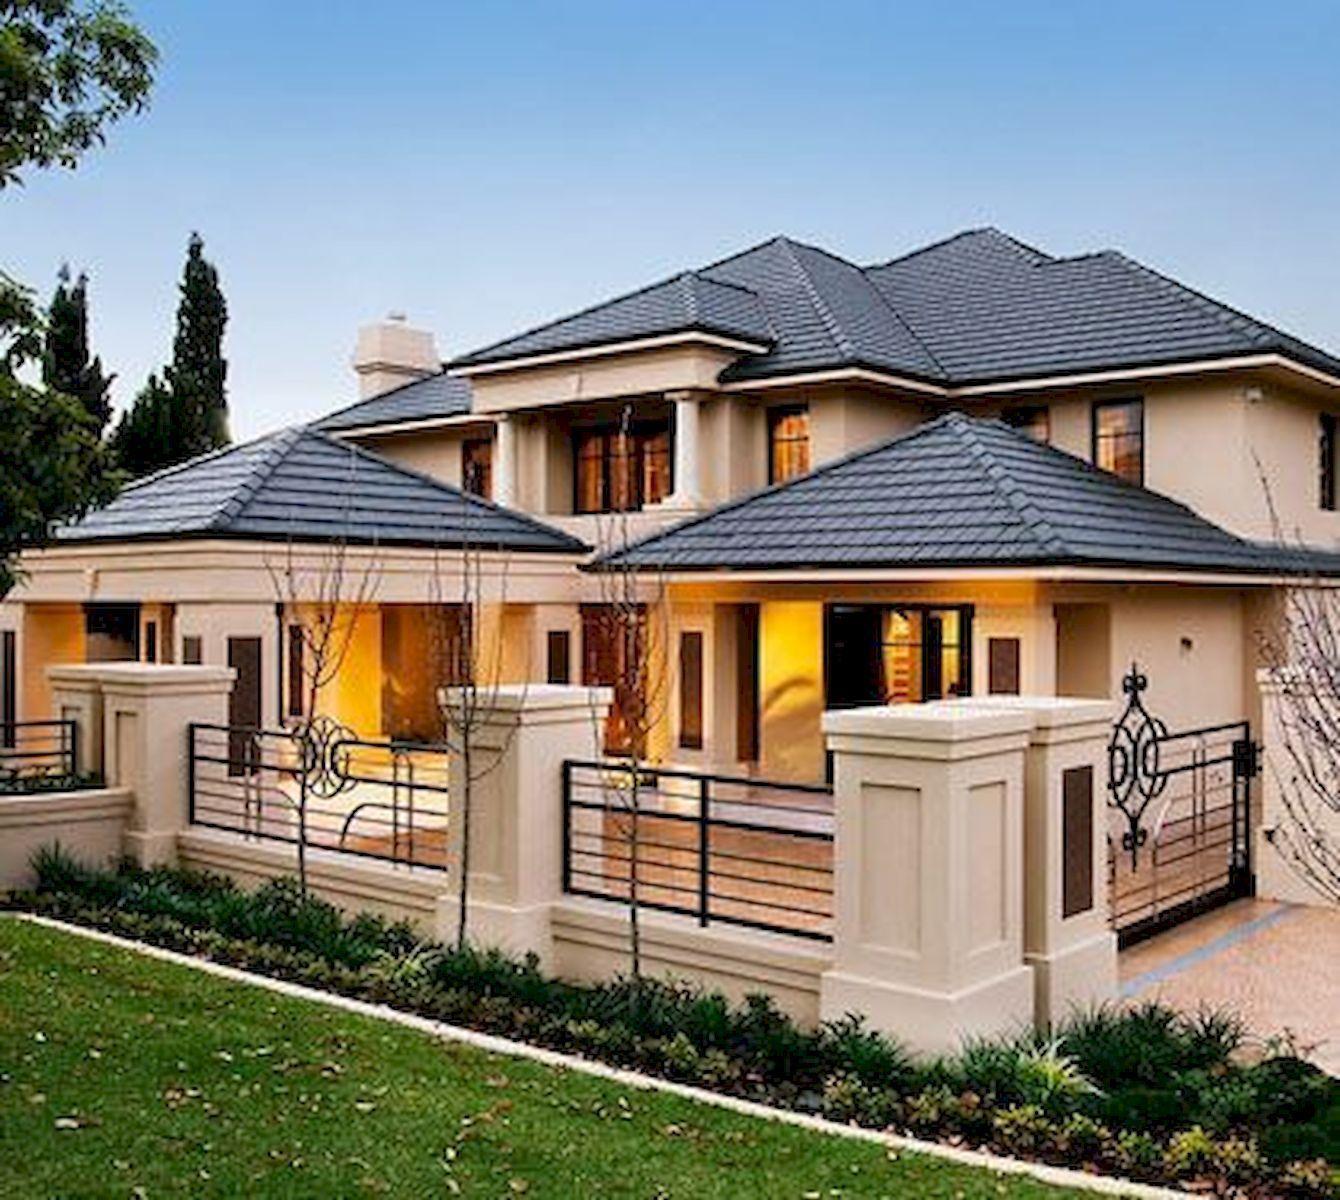 Unique Home Exterior Design: 70 Most Popular Dream House Exterior Design Ideas (27